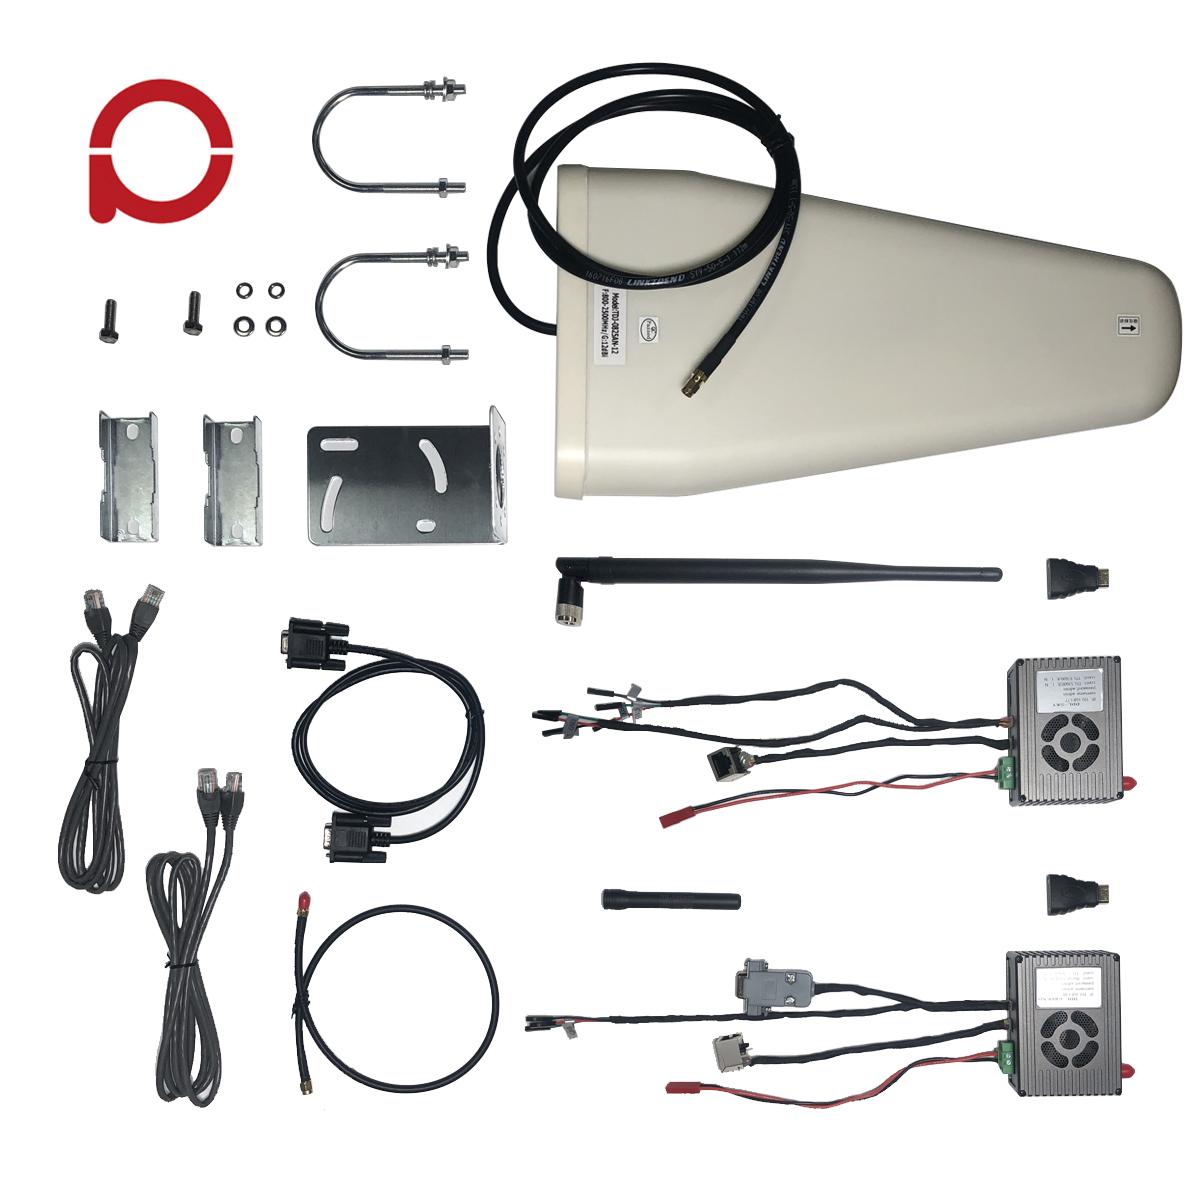 Wireless Data Link & Video Transmitter 2 in 1